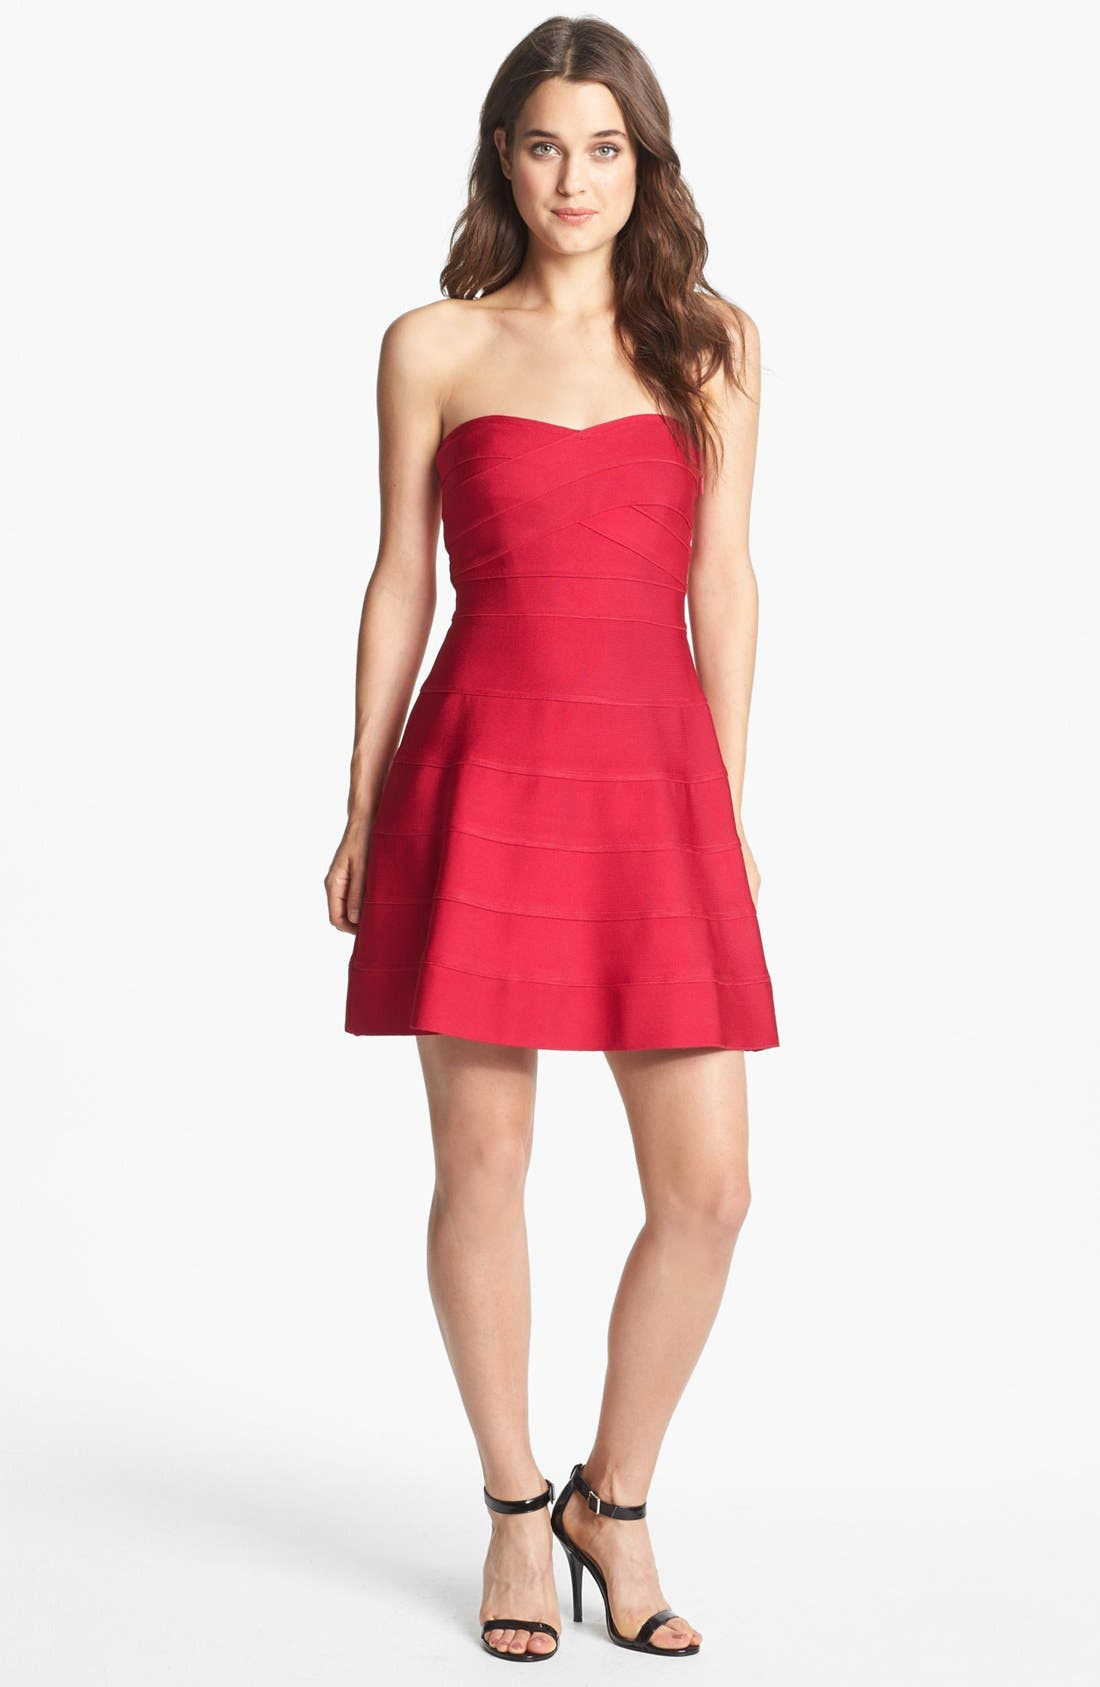 Alternate Image 1 Selected - ERIN erin fetherston 'Jane' Bandage Fit & Flare Dress